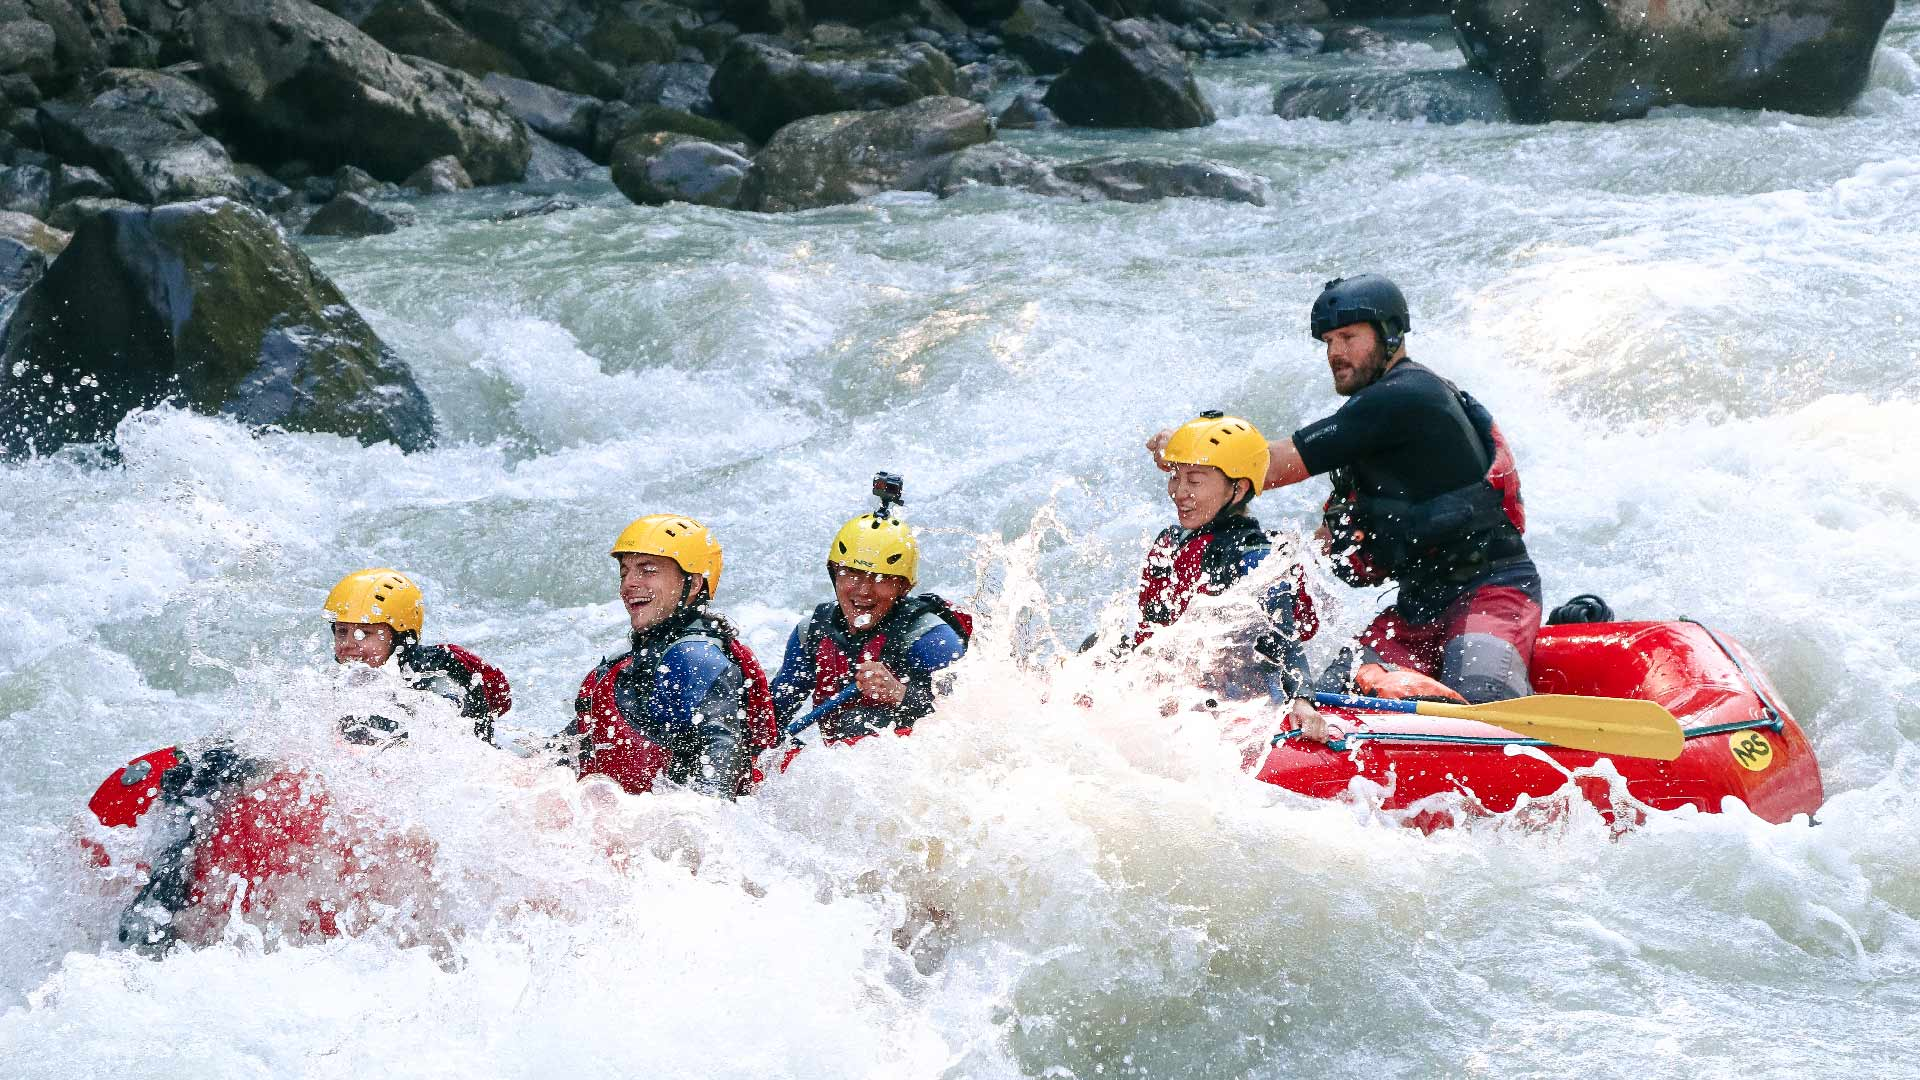 river-rafting-sommer-adventure-spass-wasser